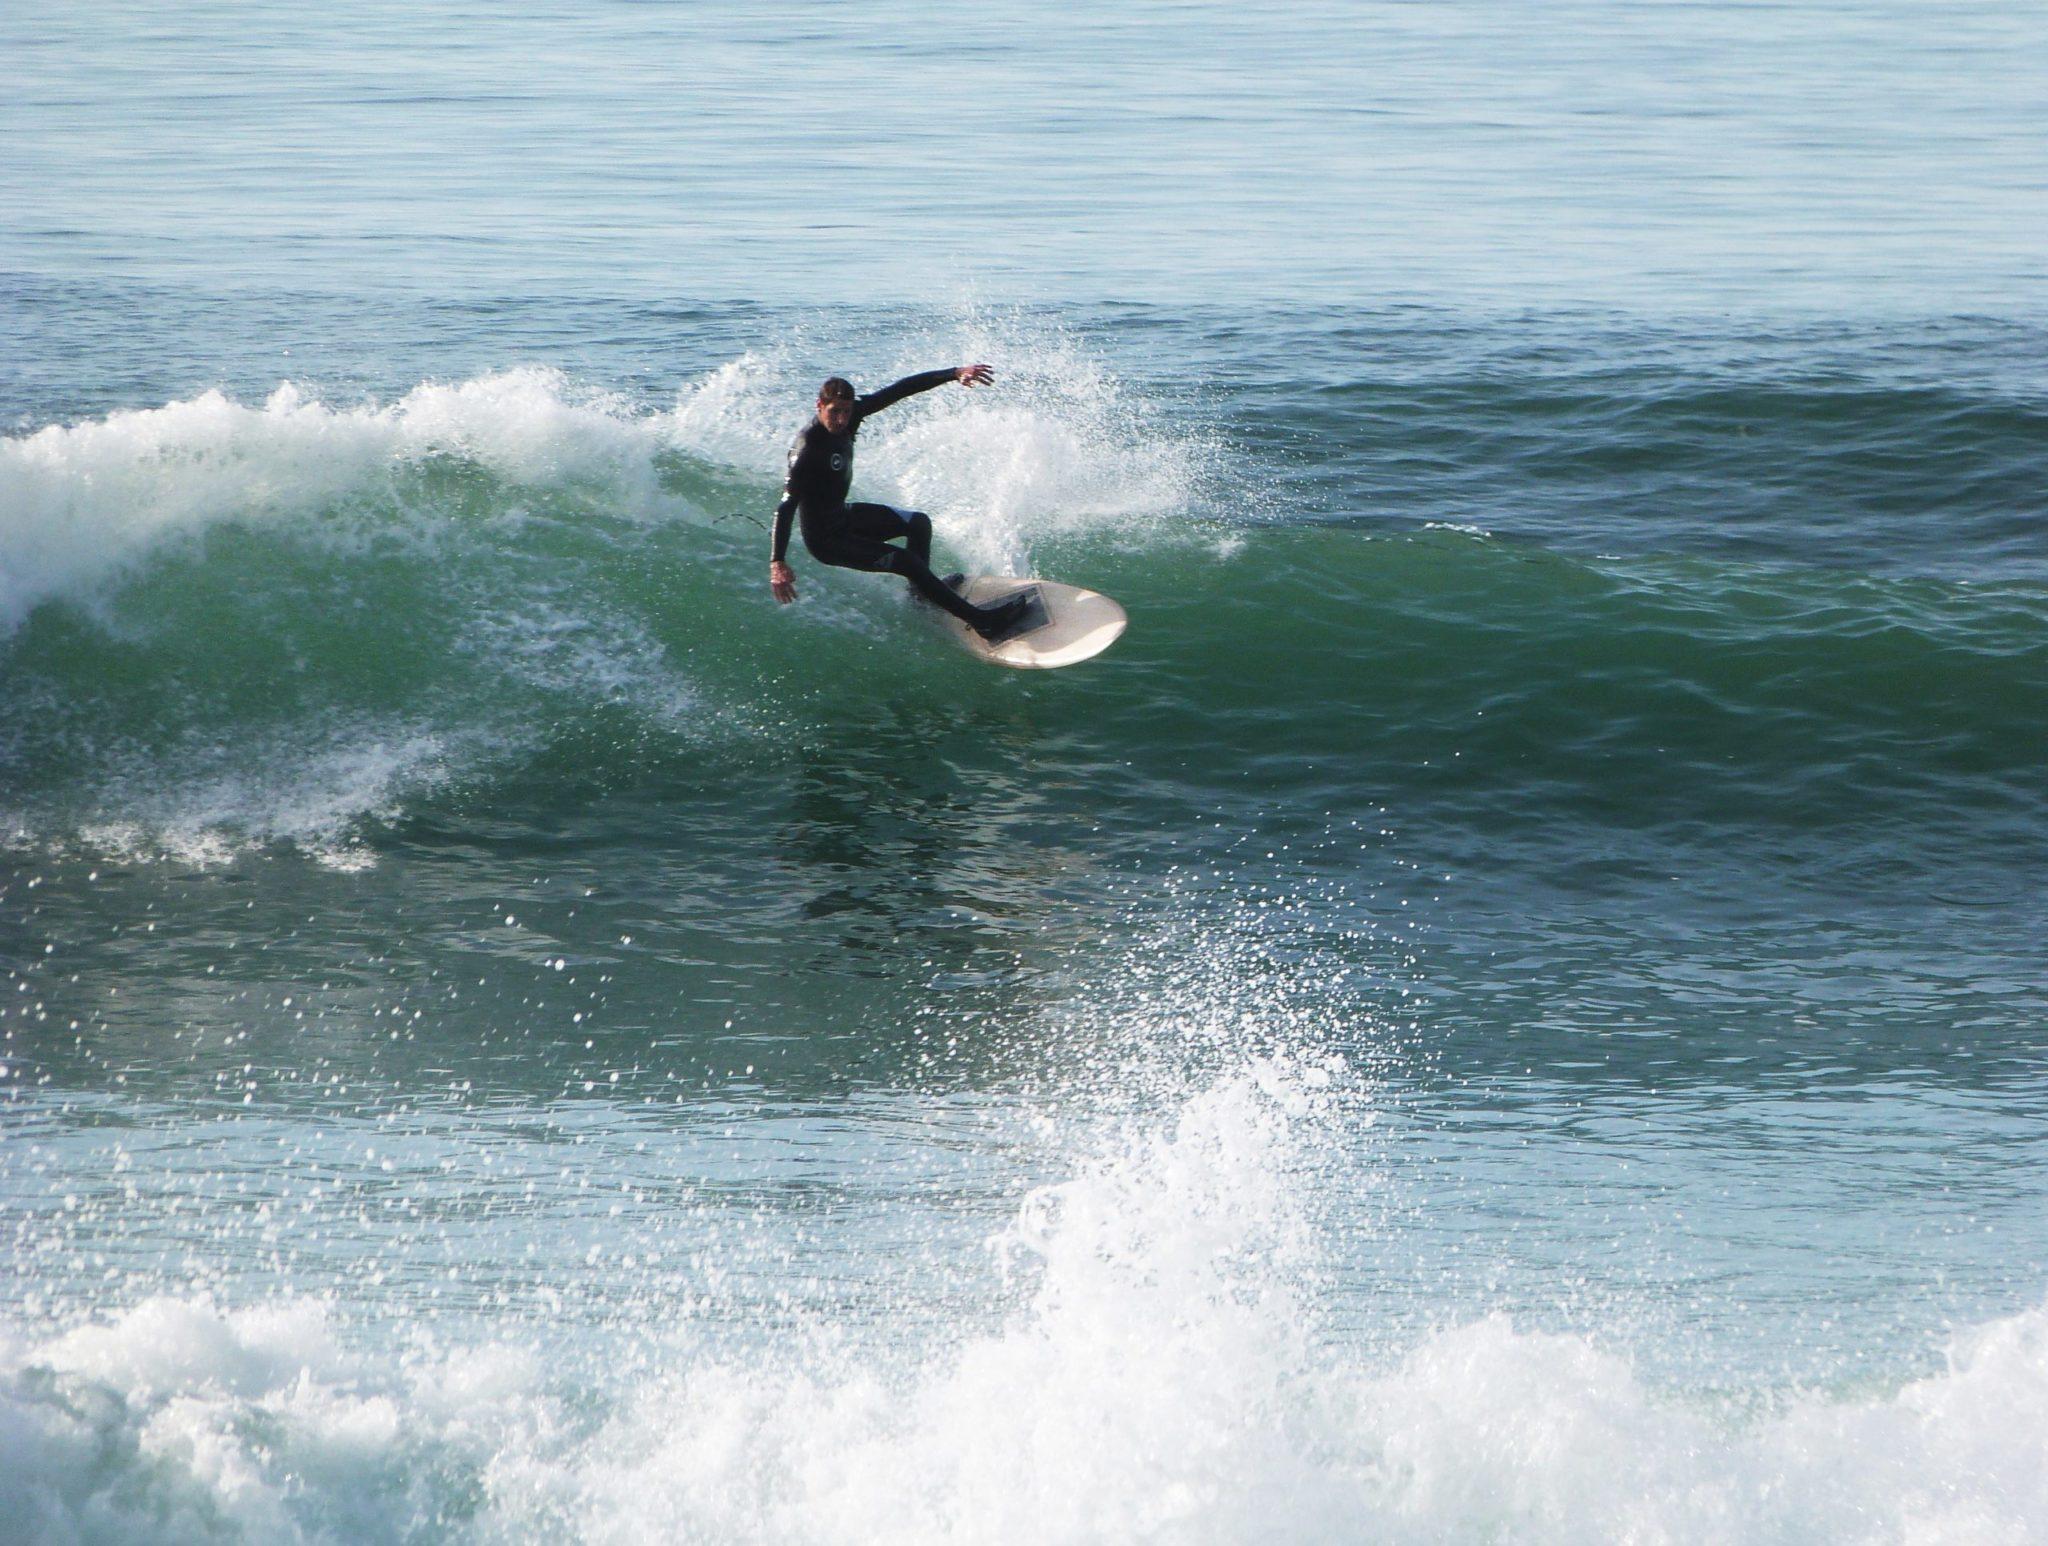 Cachalot Surfboards planche surfboard artisan surf shaper bois hollow wooden bois bonzer